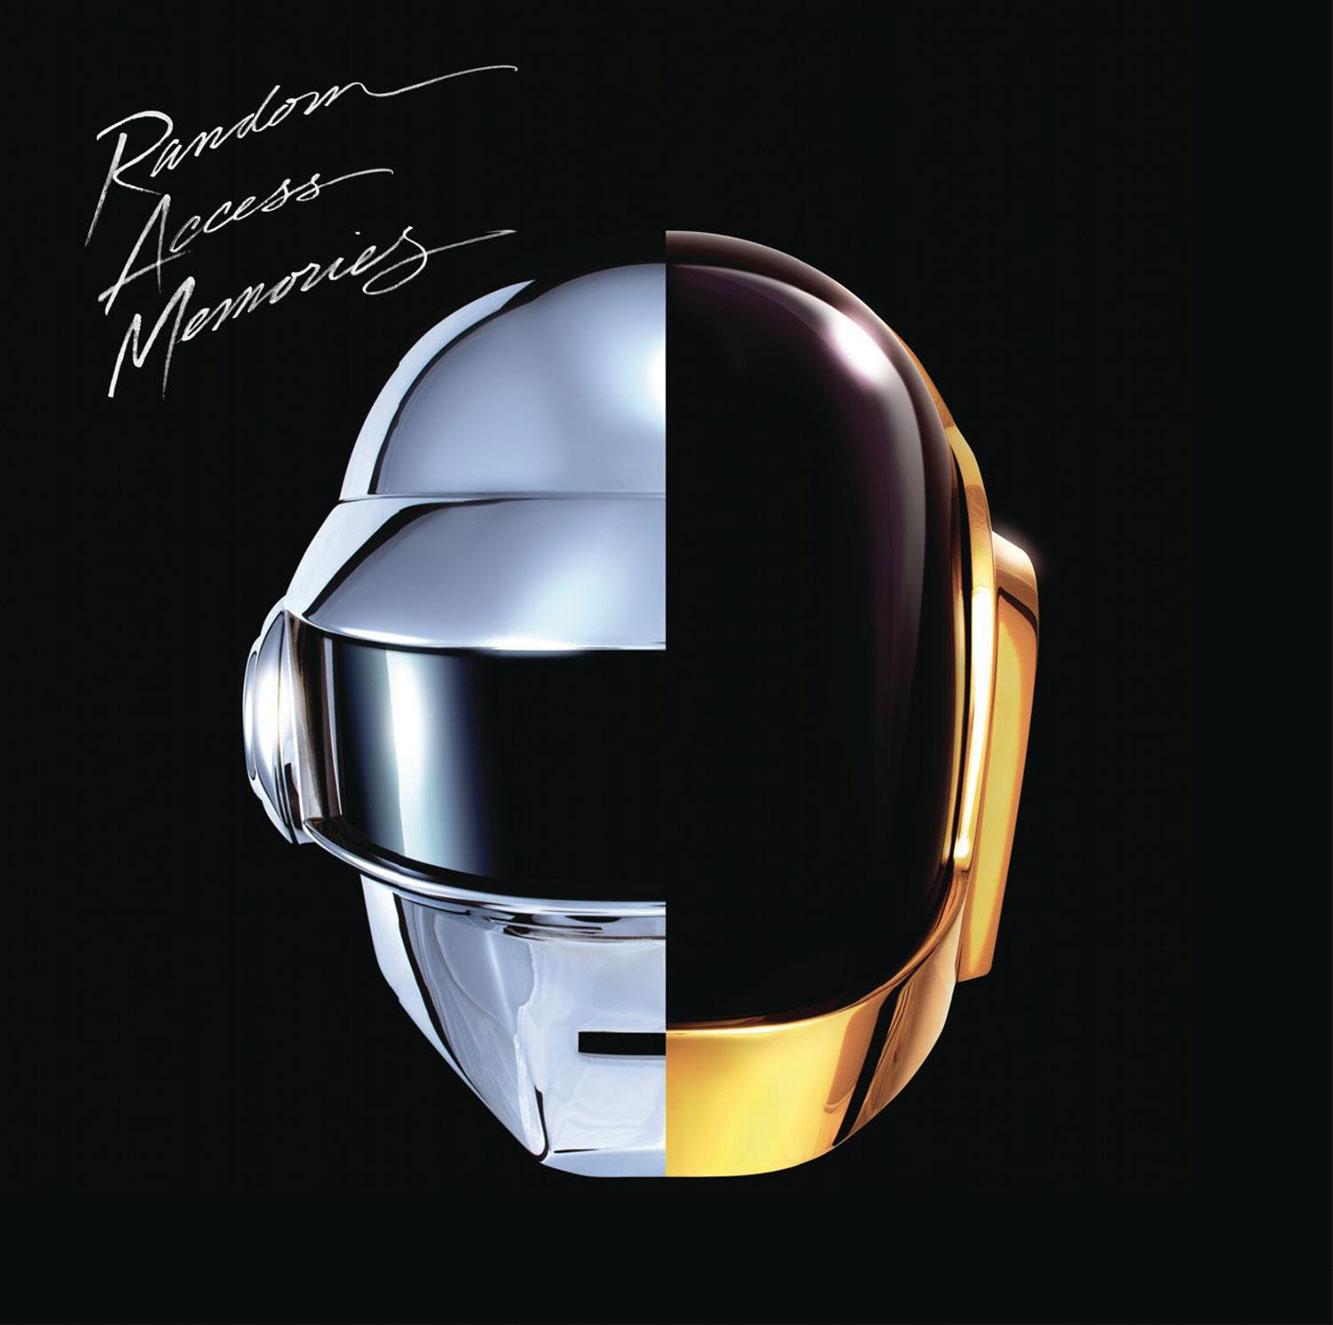 Random Access Memories by Daft Punk